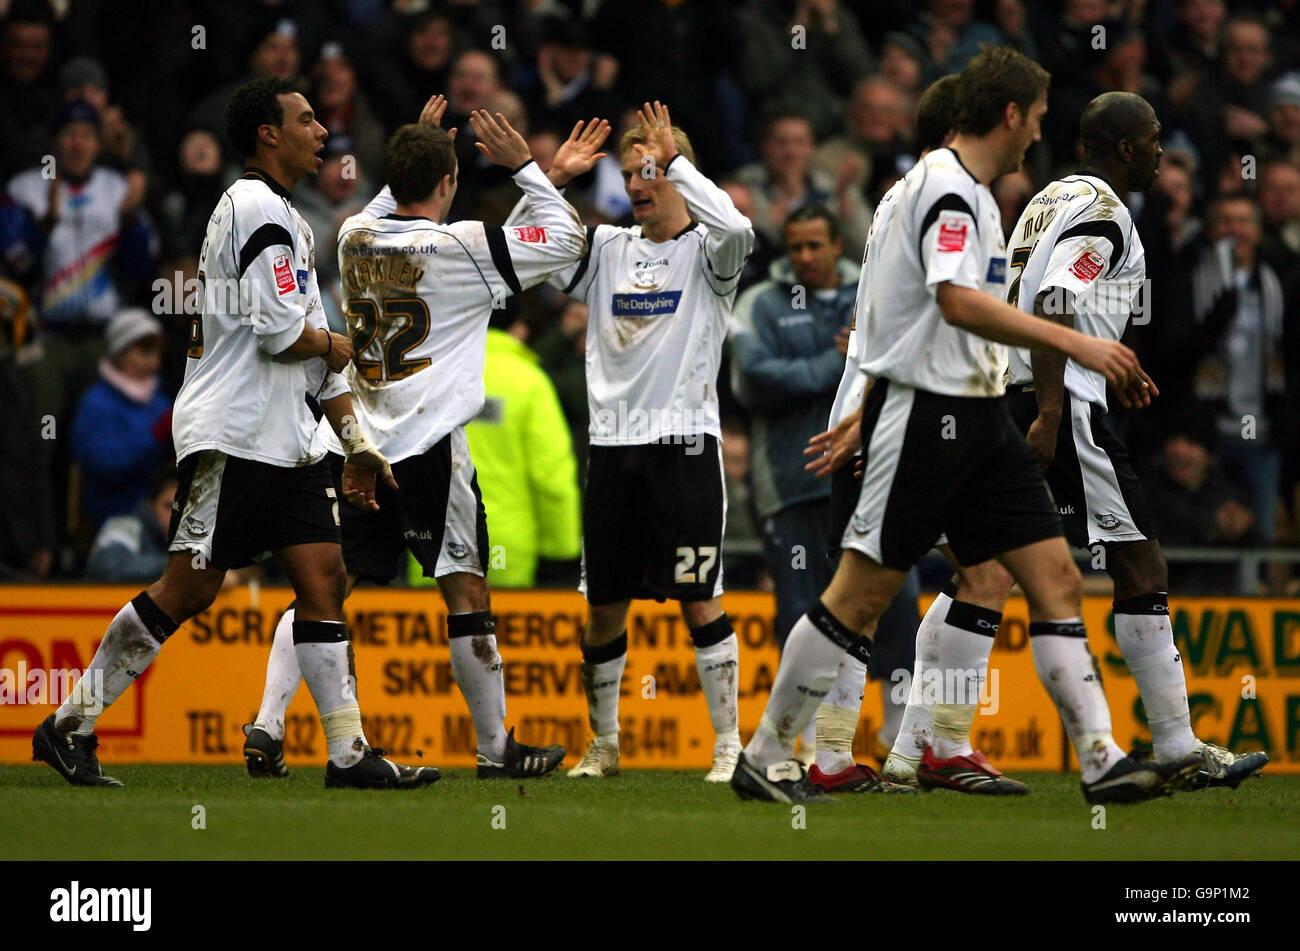 Soccer - Coca-Cola Football Championship - Derby County v Hull City - Pride Park - Stock Image